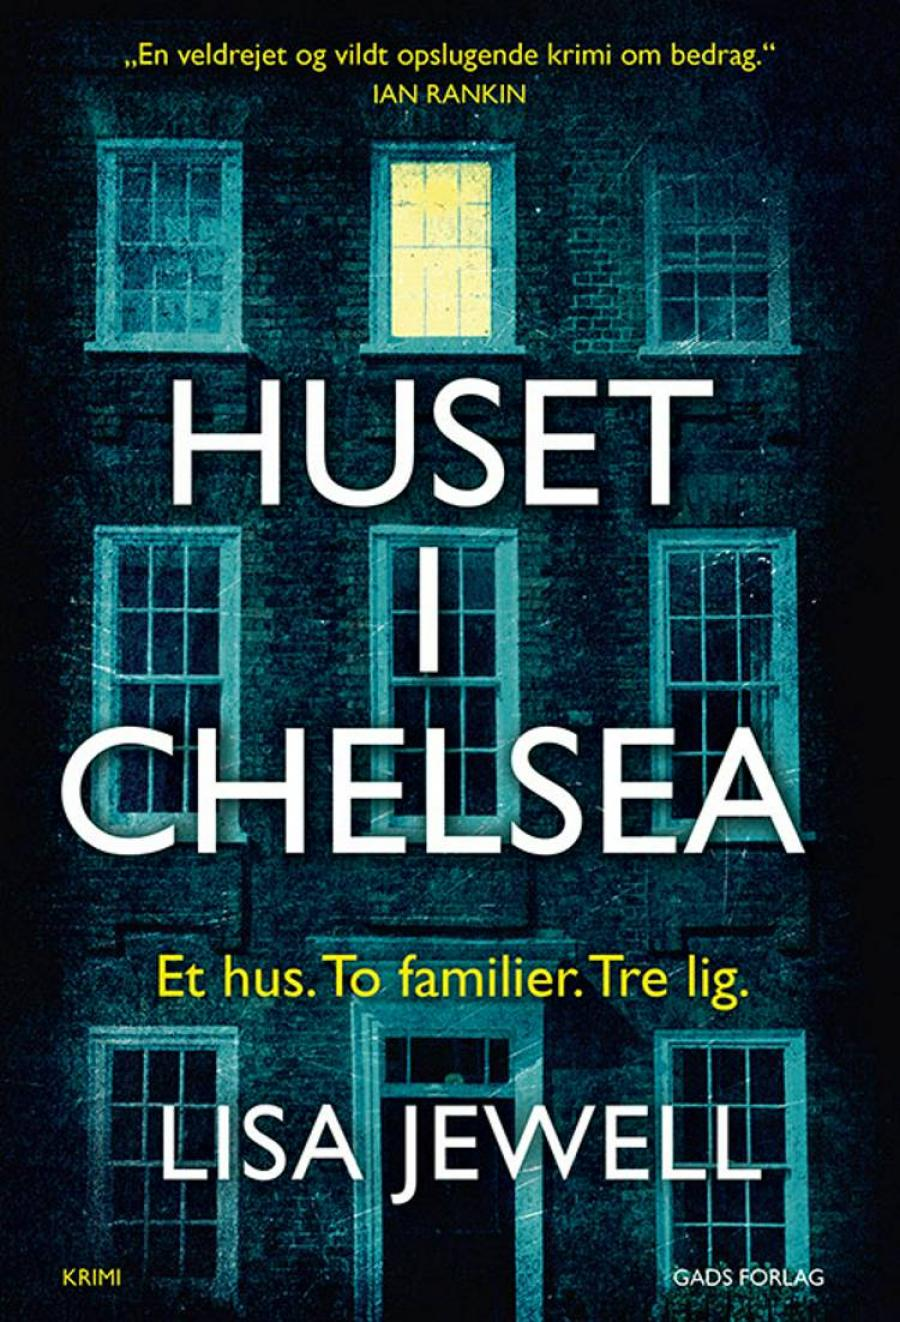 Huset i Chelsea